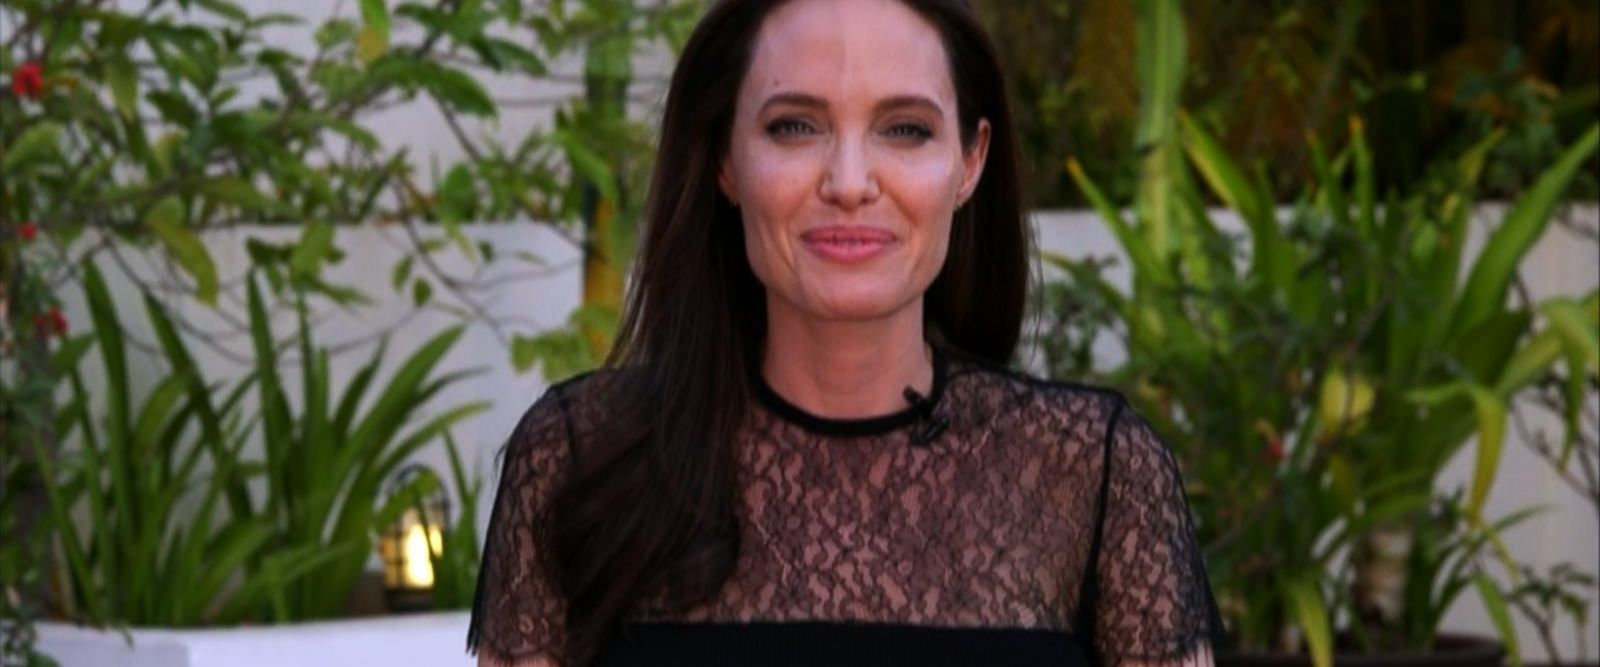 VIDEO: Angelina Jolie speaks out on Brad Pitt, new film